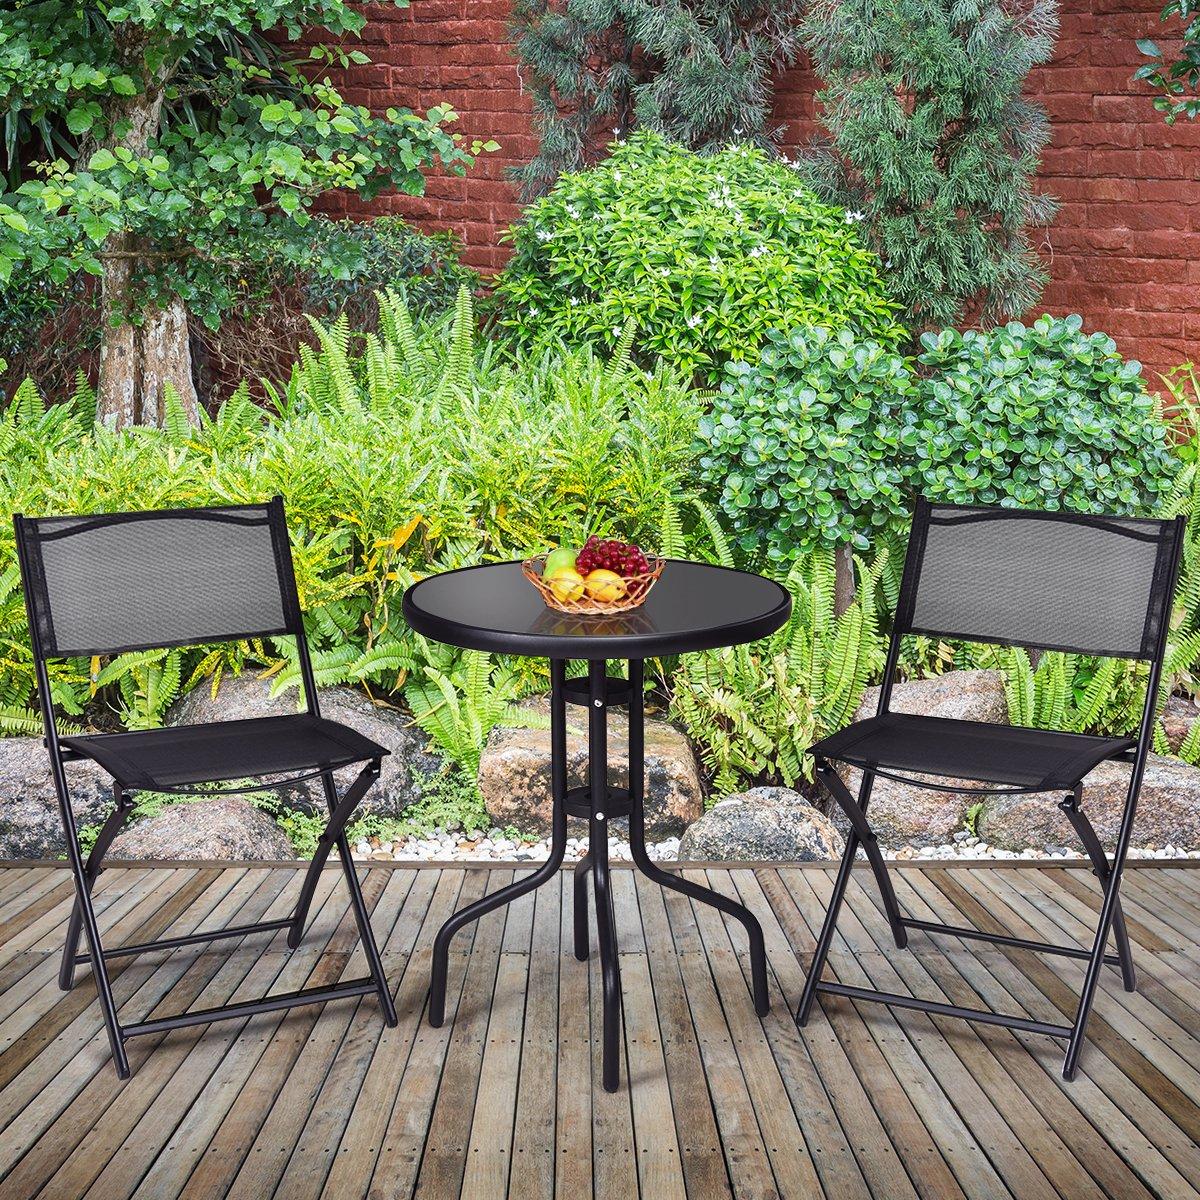 Giantex 3 Pcs Bistro Set Garden Backyard Round Table